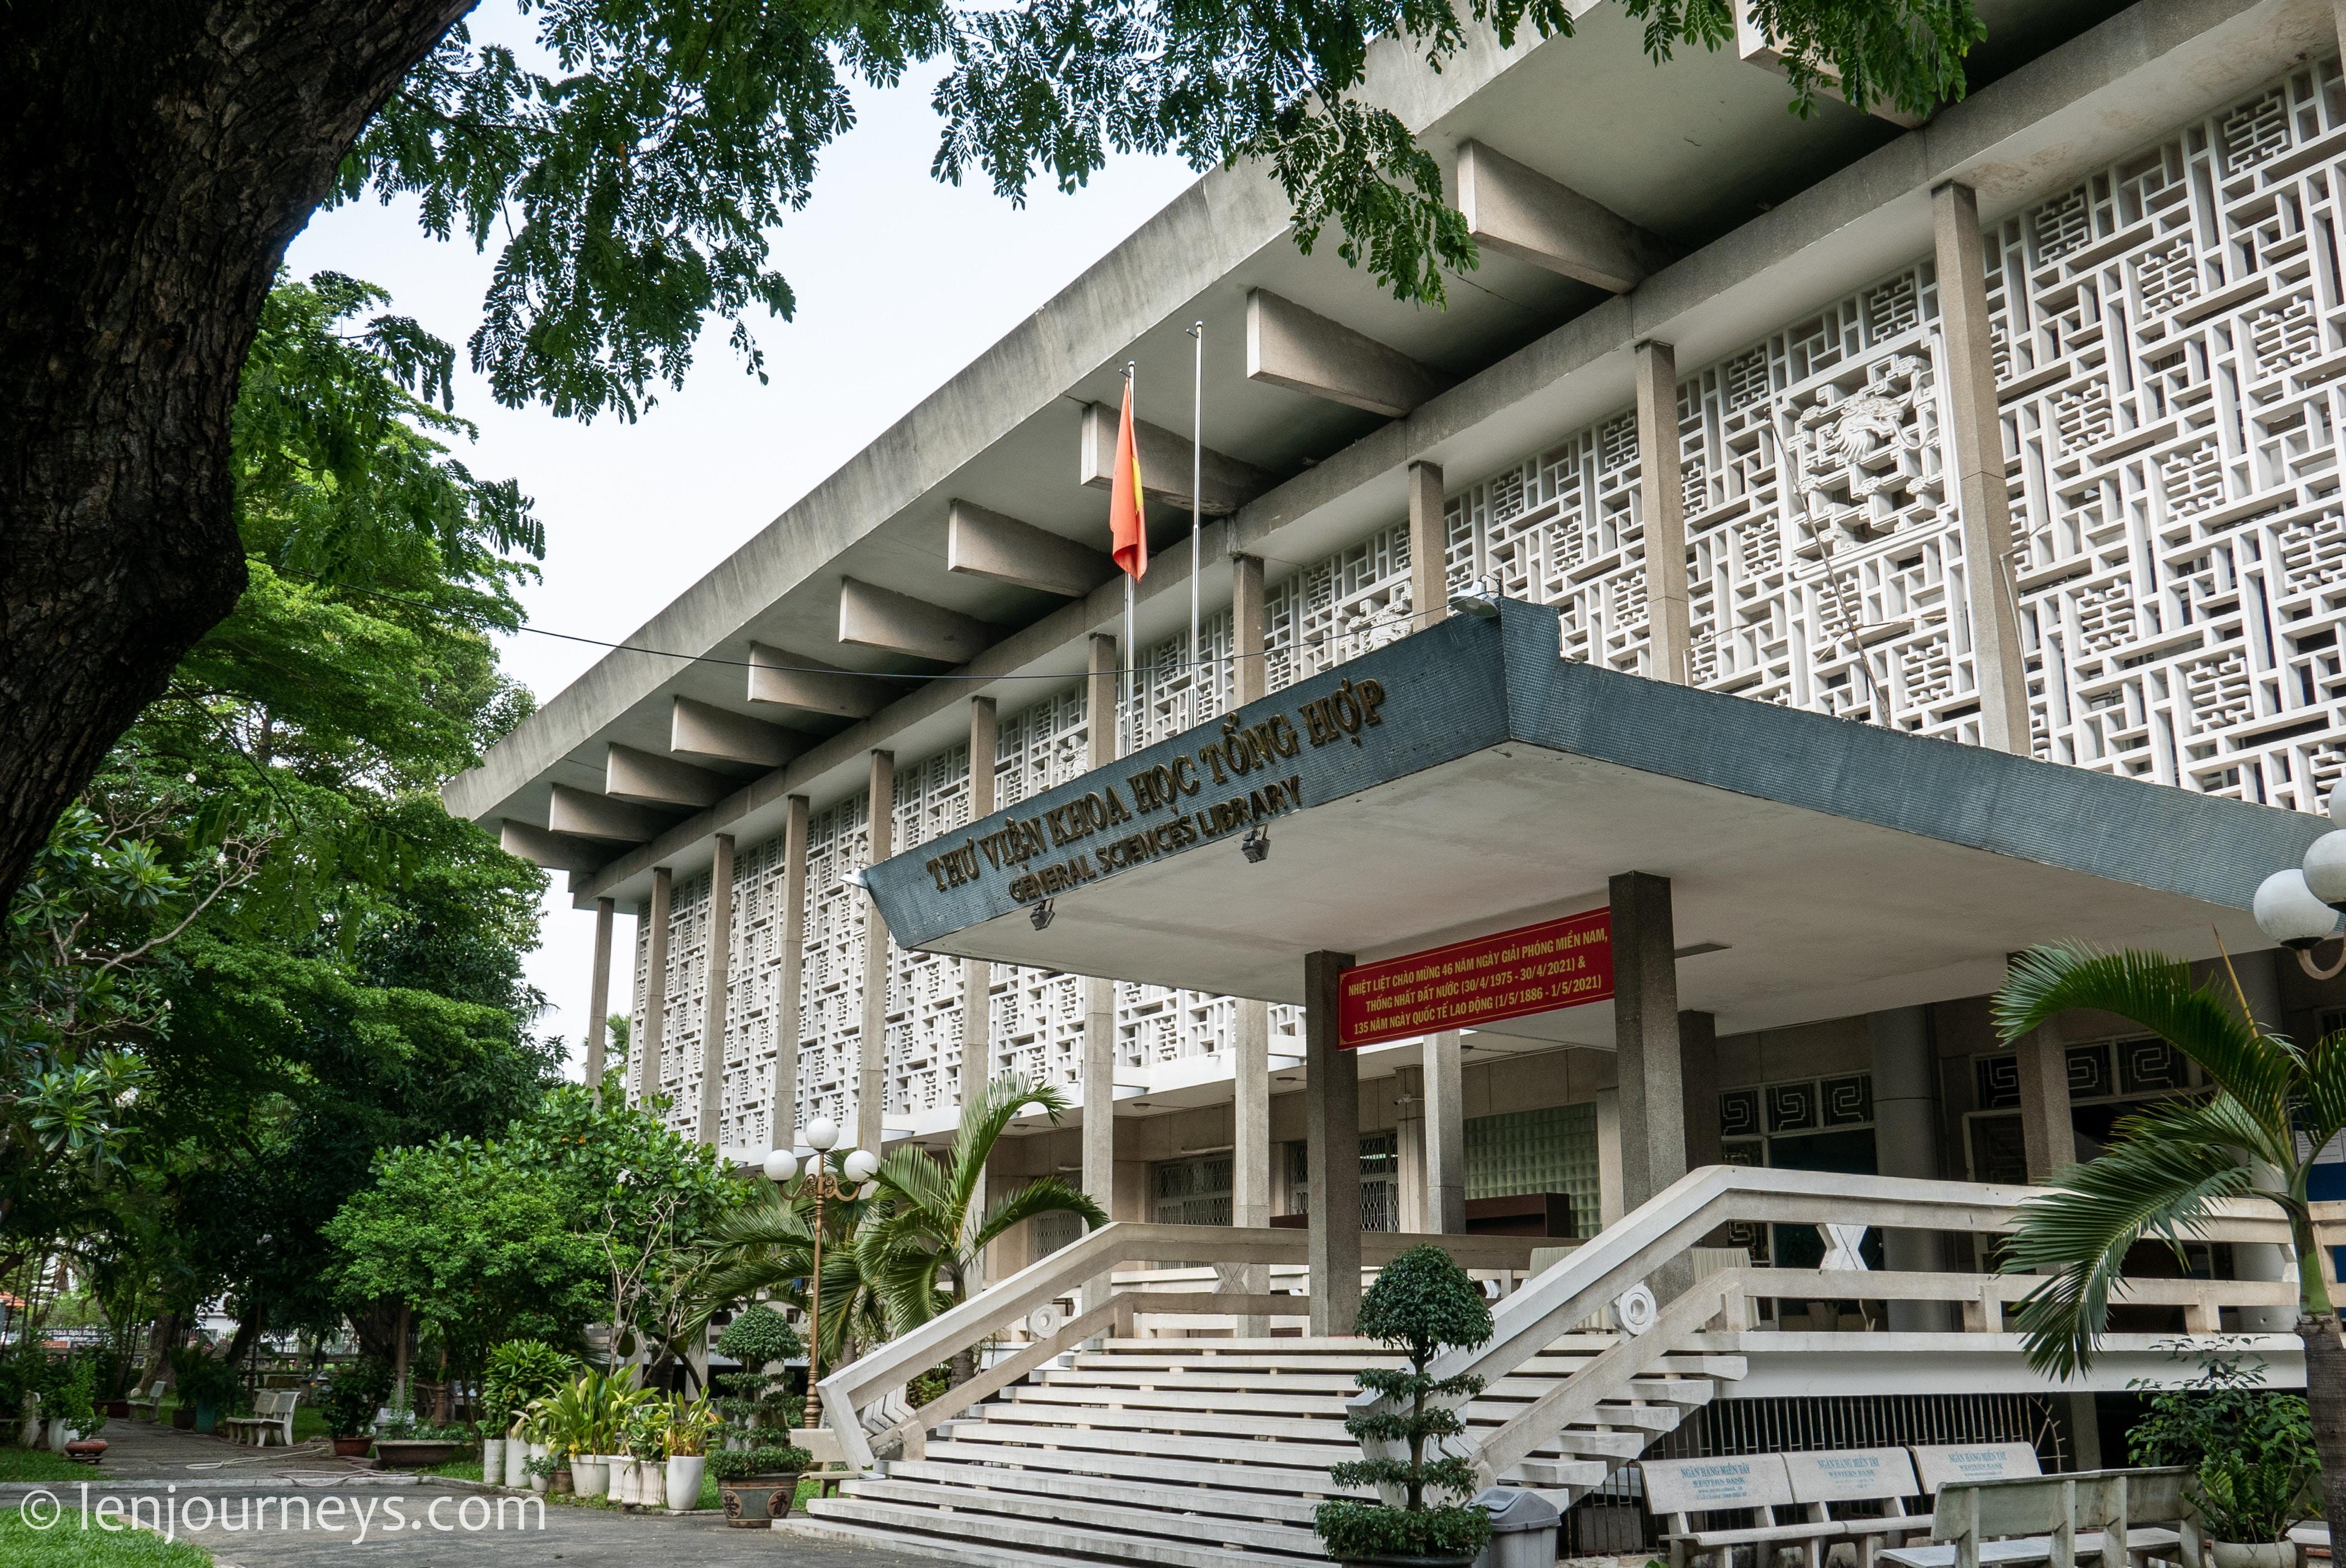 HCMC General Science Library - a hidden gem architectural gem in Saigon